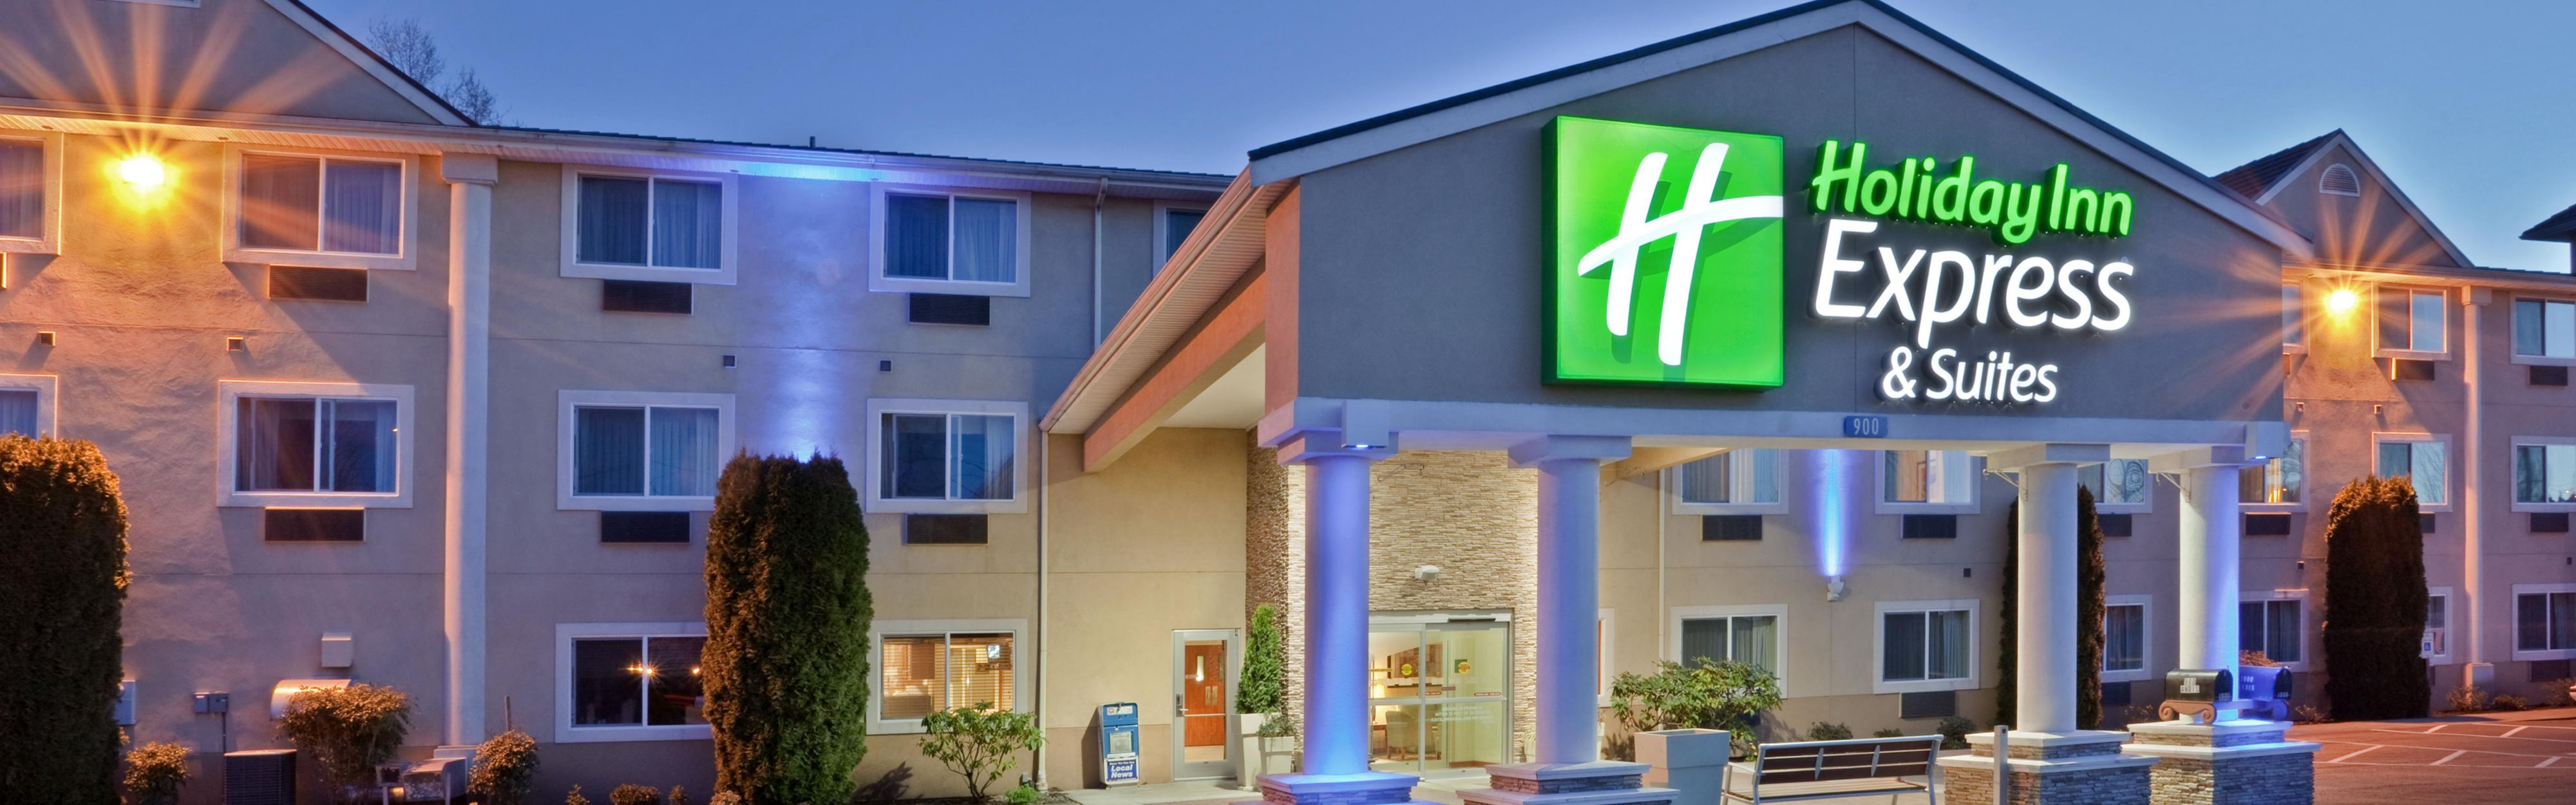 Holiday Inn Express & Suites Burlington image 0